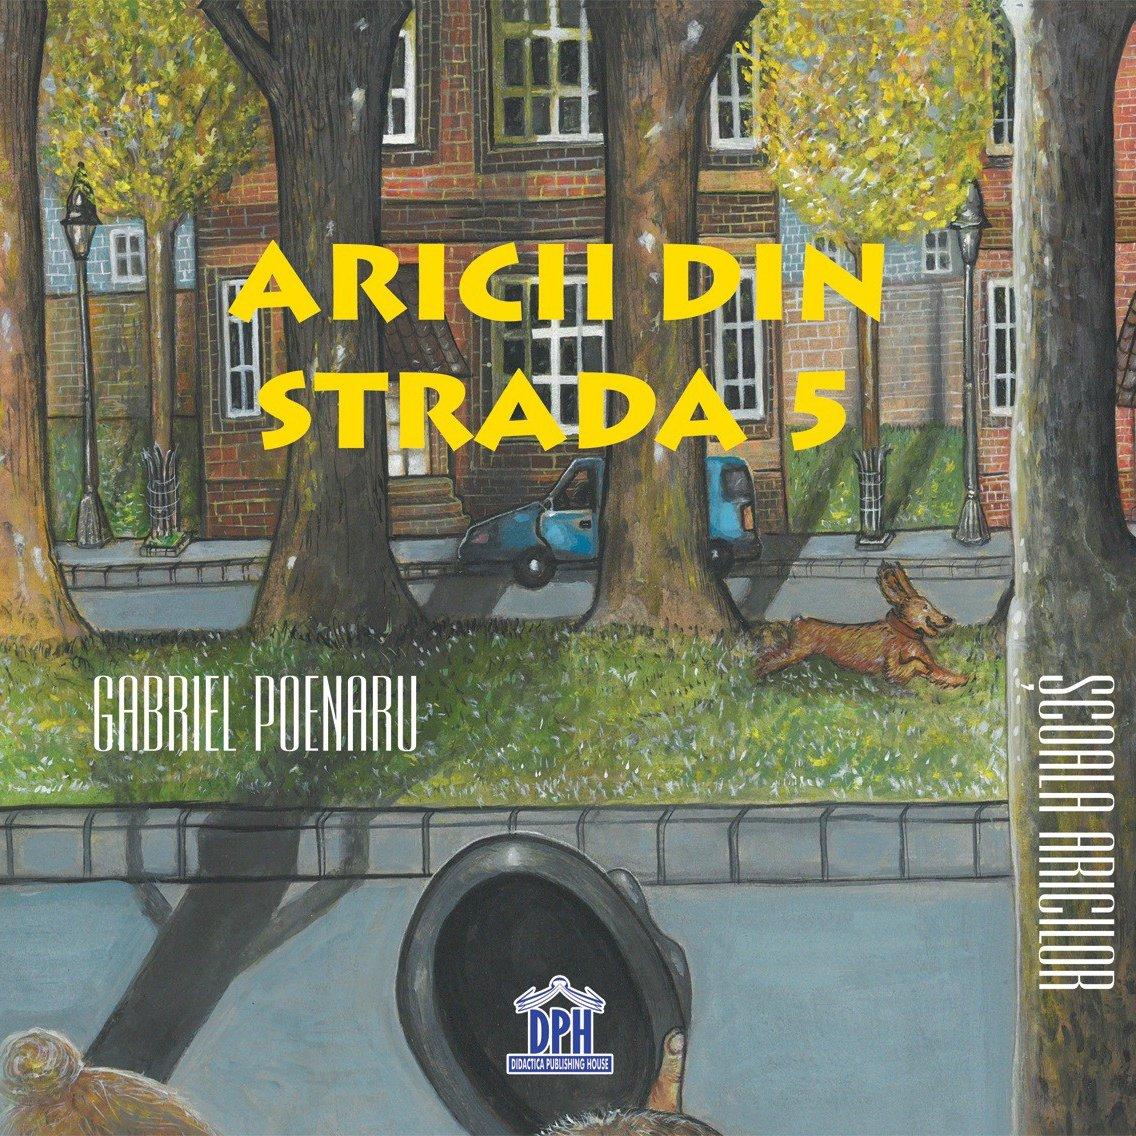 Carte Aricii din strada 5, Editura DPH imagine